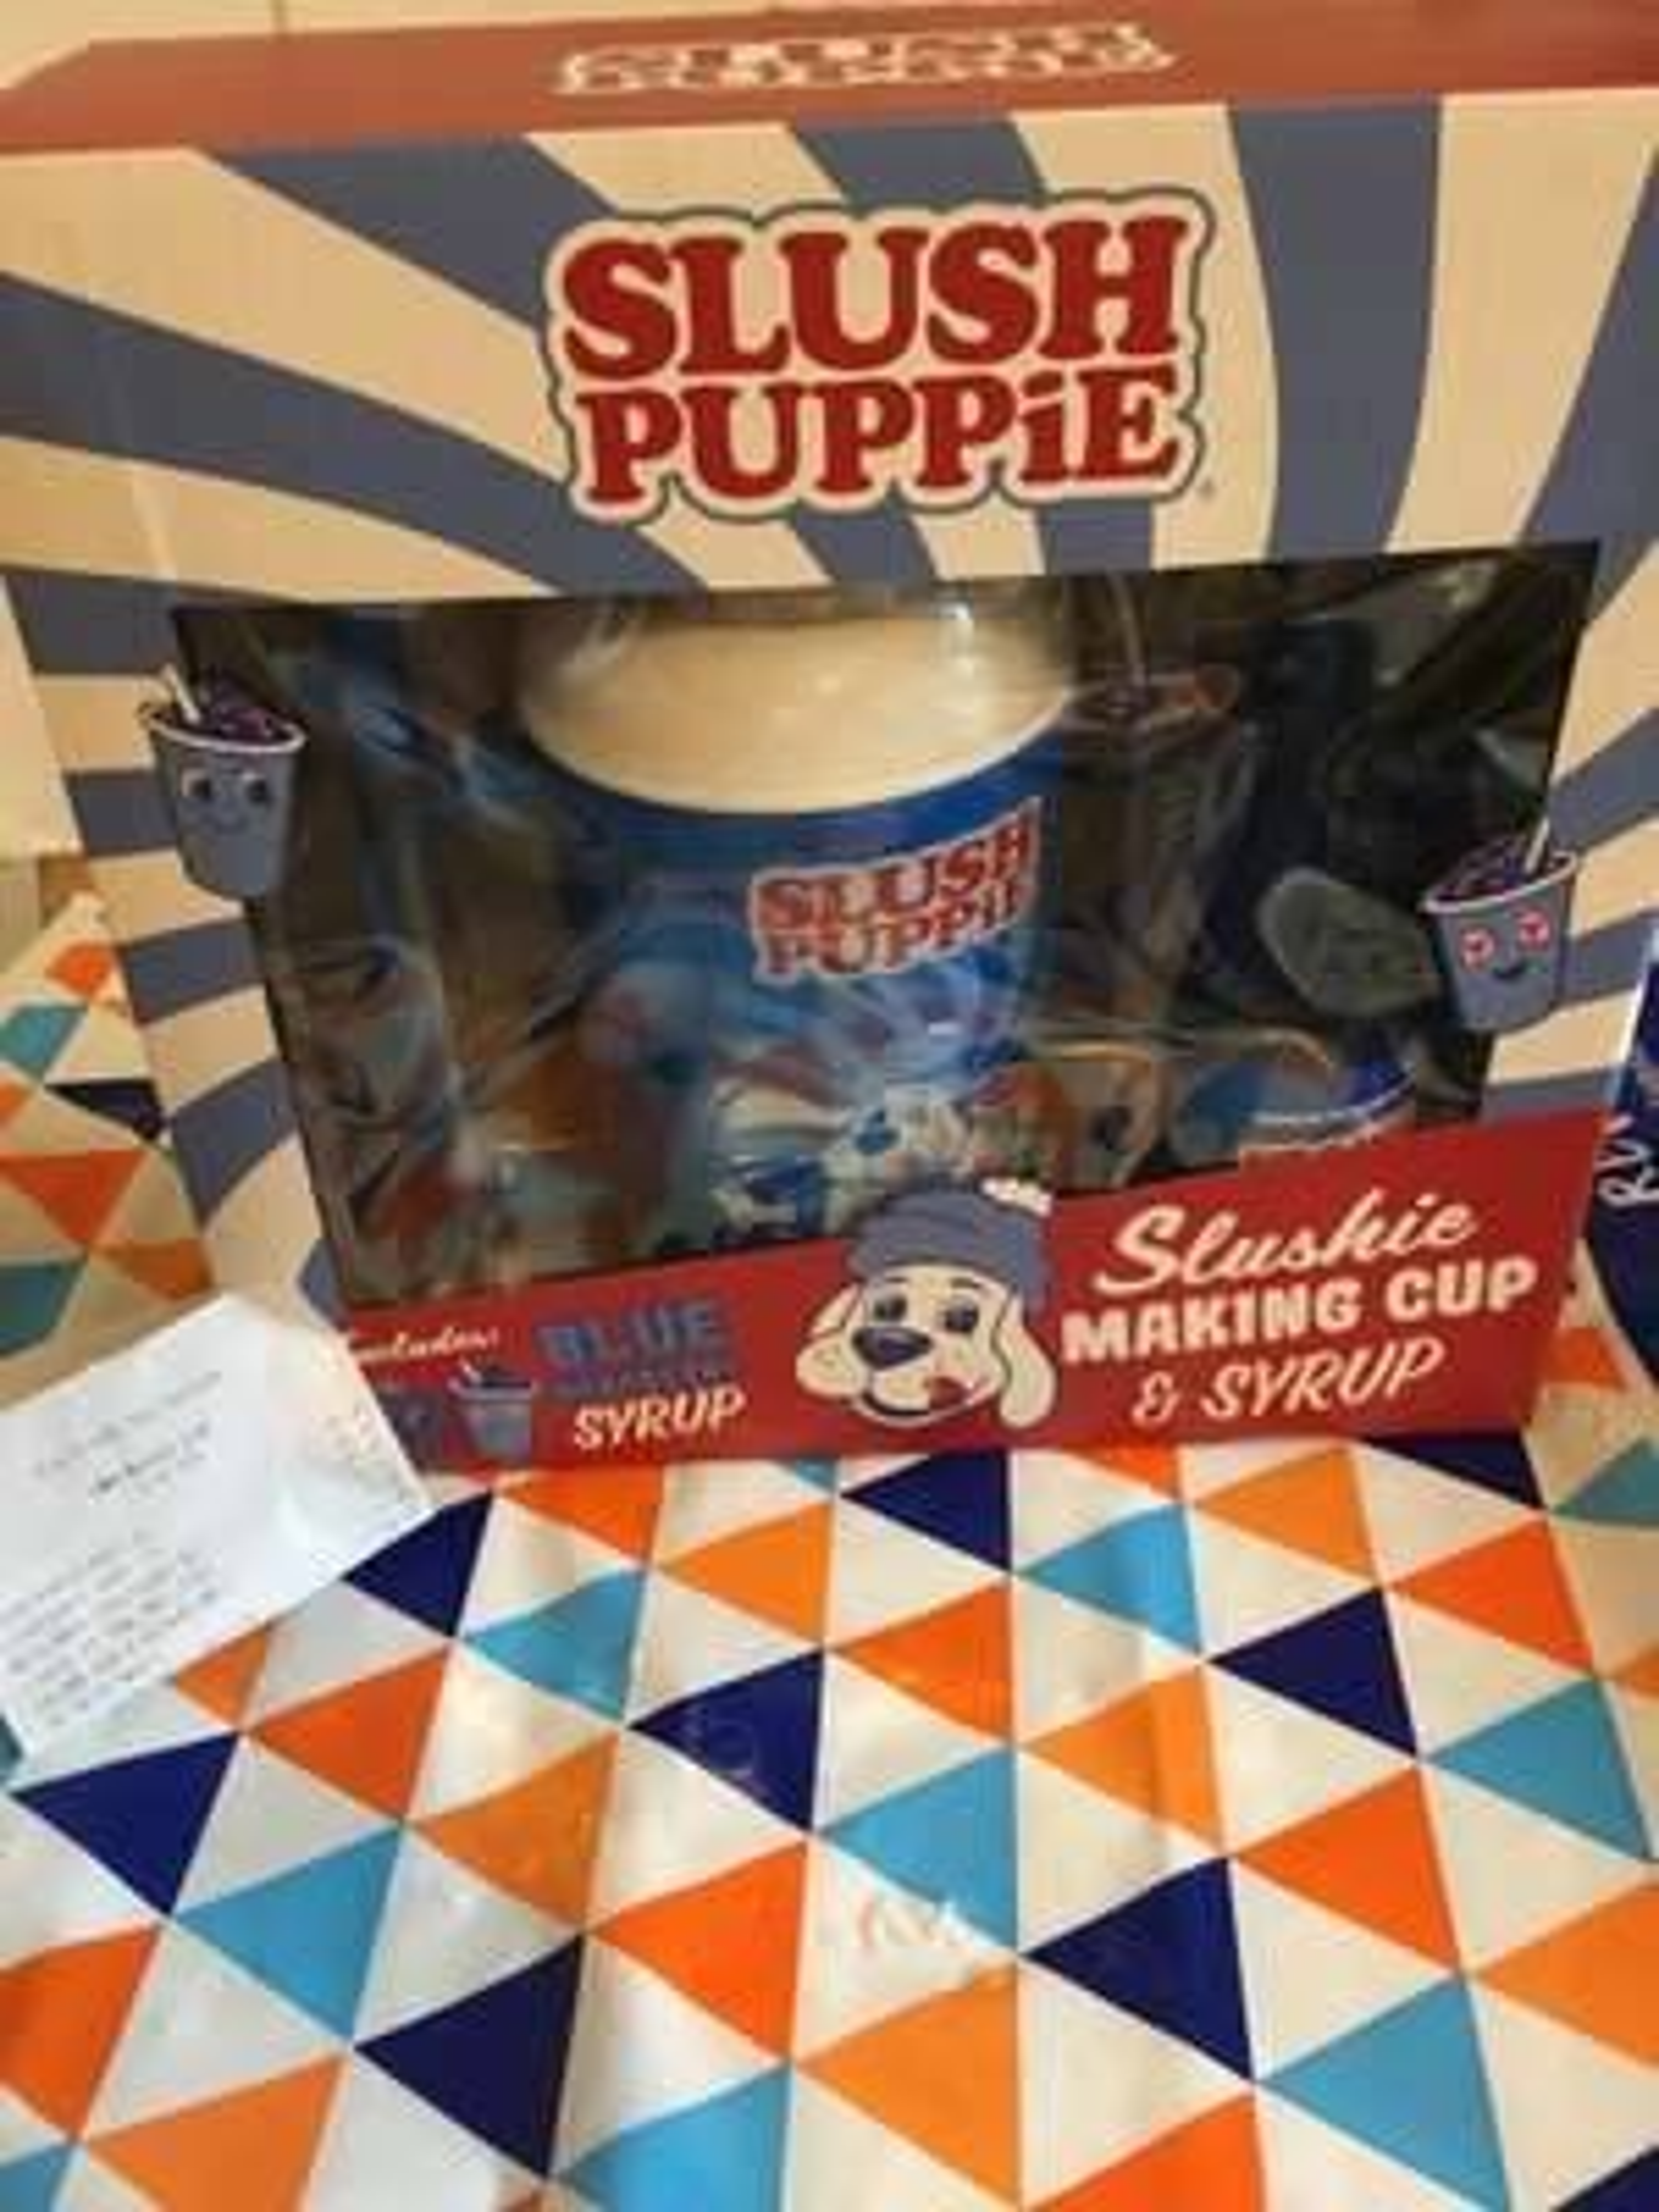 Slush Puppie slushie making cup and syrup gift set only £5.99 @ B&M (Cheadle)